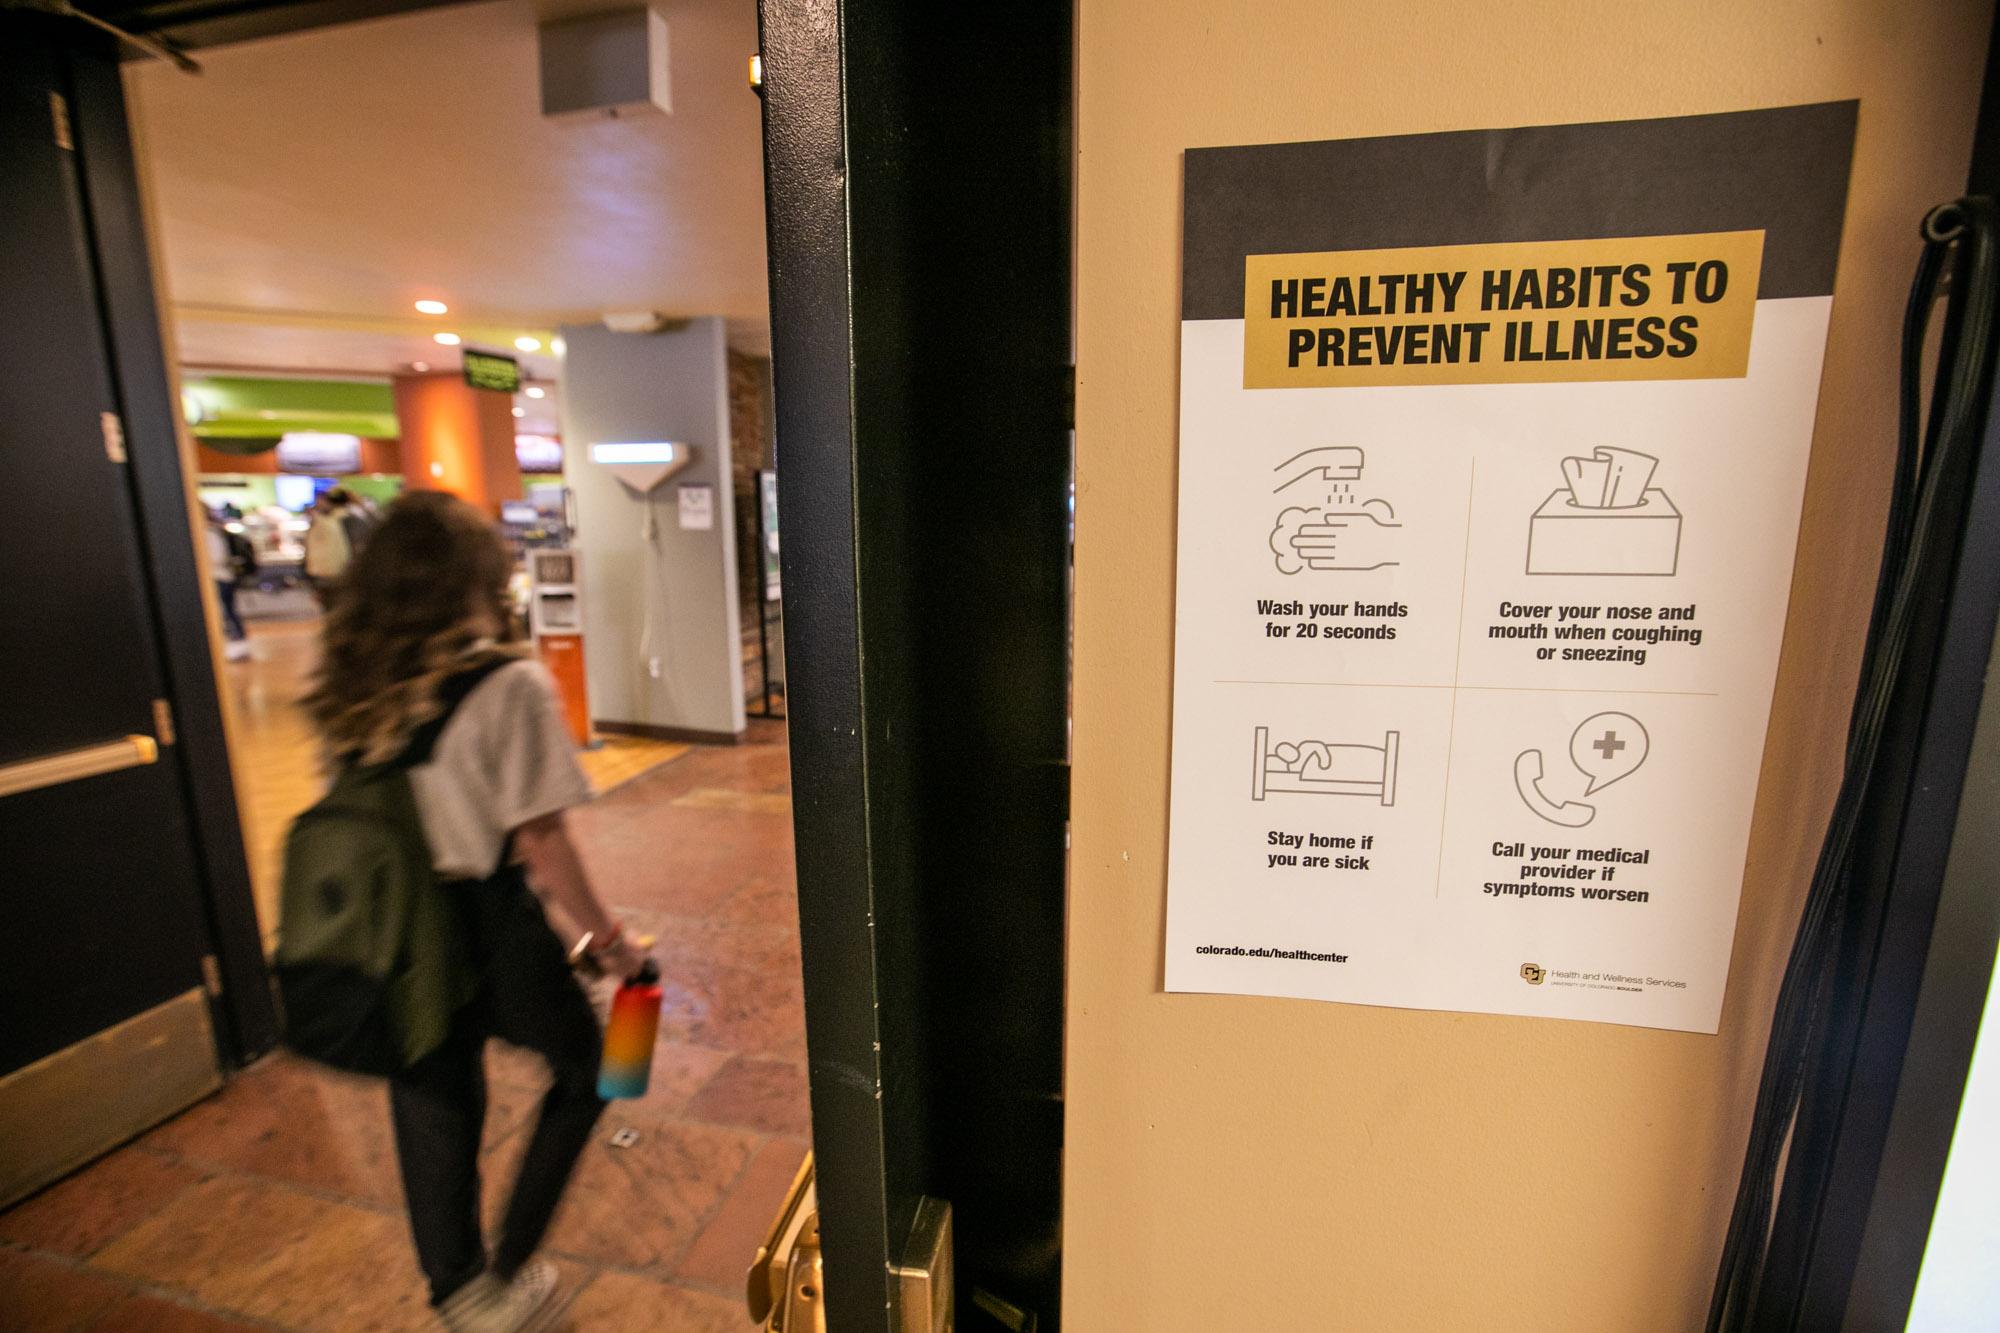 Coronavirus CU Boulder Cancels In-Person Classes